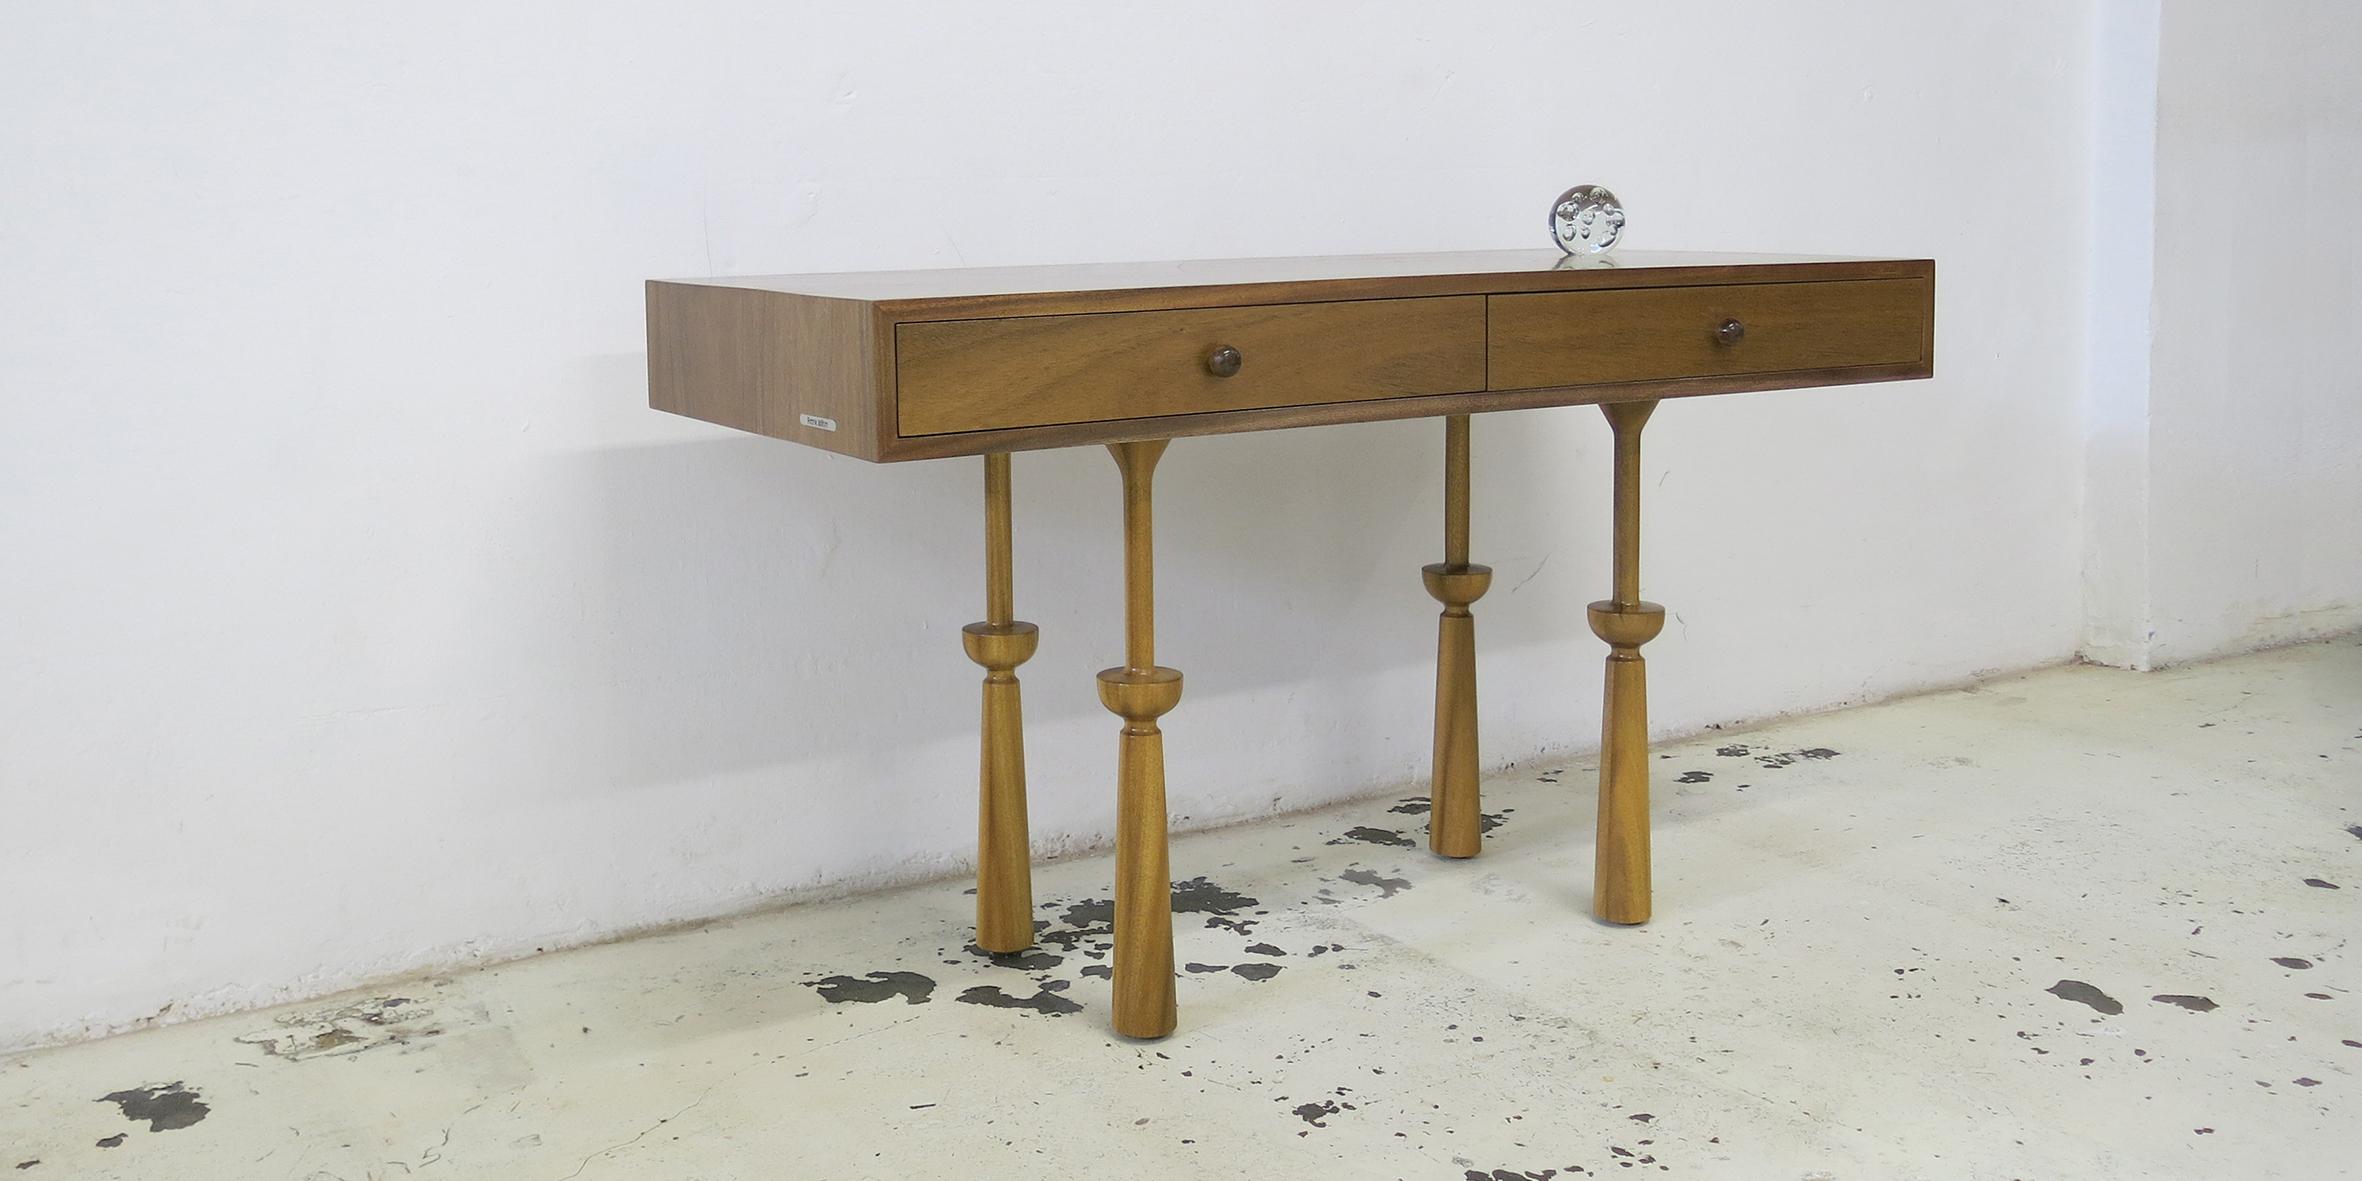 andreas desk, 1360 l x 576 w x 780 h, african walnut